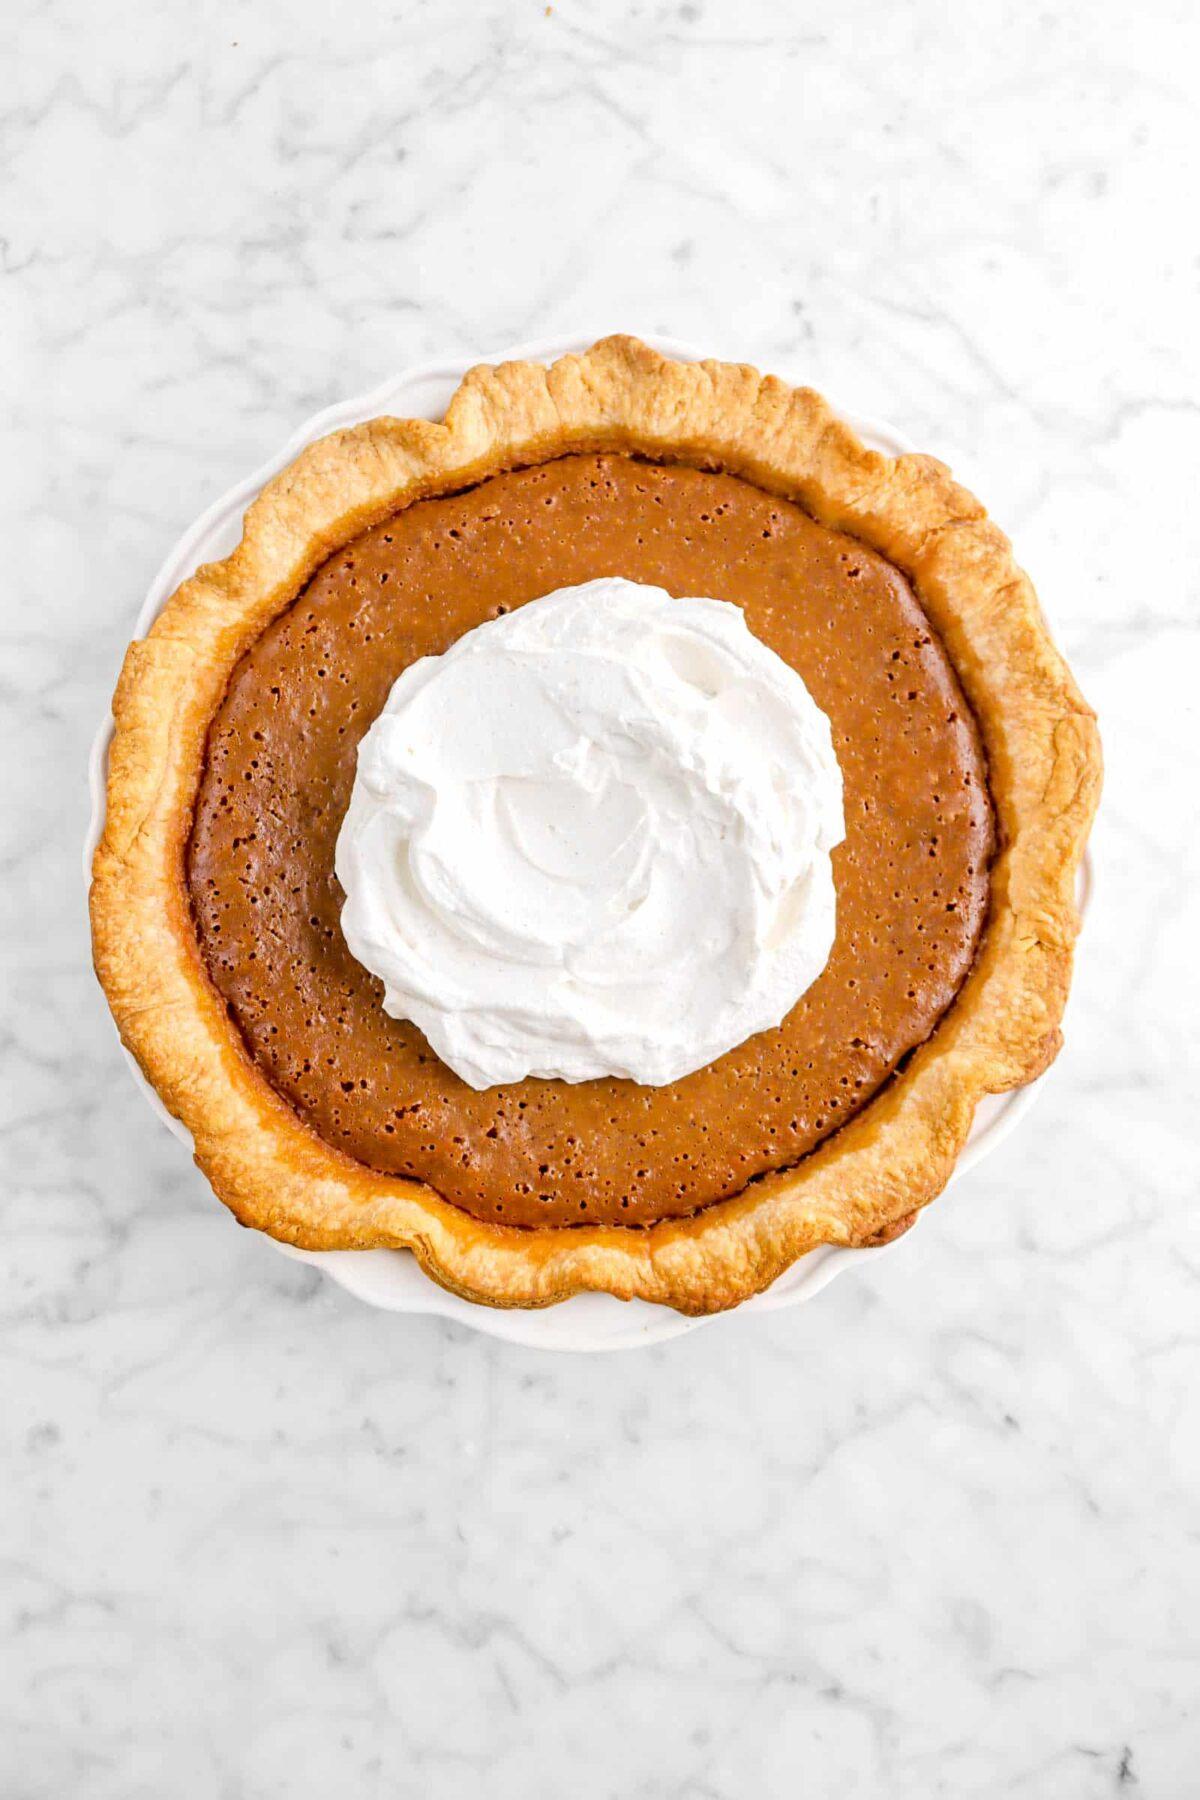 whip cream added on top of pumpkin pie